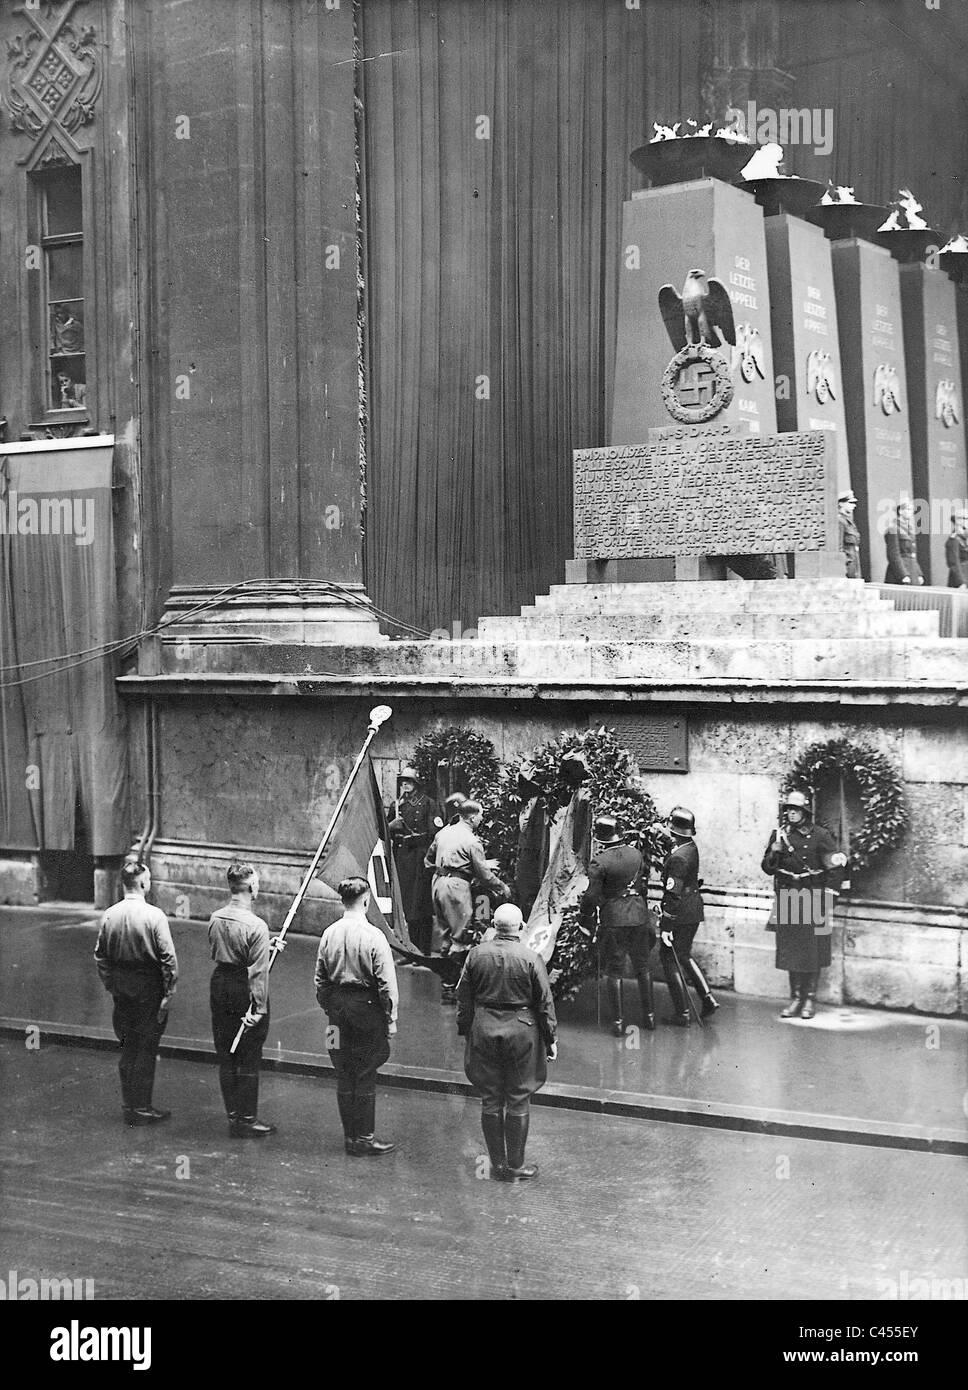 Fotos Hitler 9 Hitler 1923 Stock 9 November Immagini amp; November 1923 zq6RF